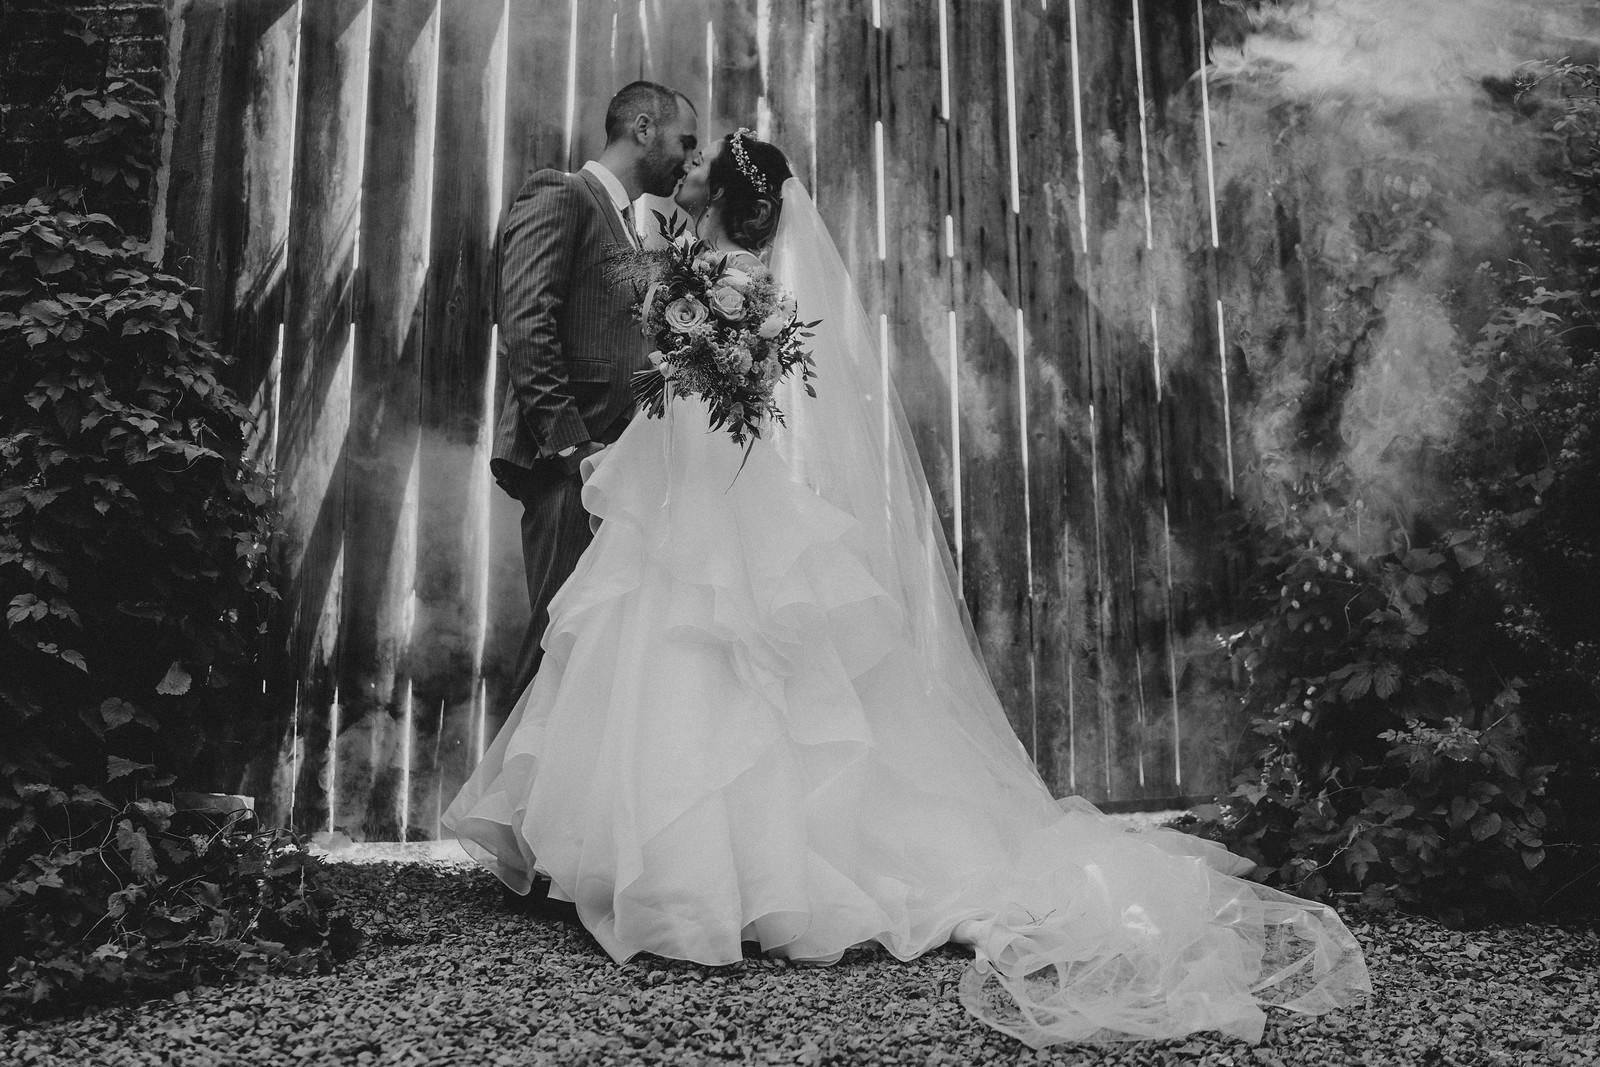 Bride and Groom Wedding Photo Kiss - Wedding Photographer Derbyshire